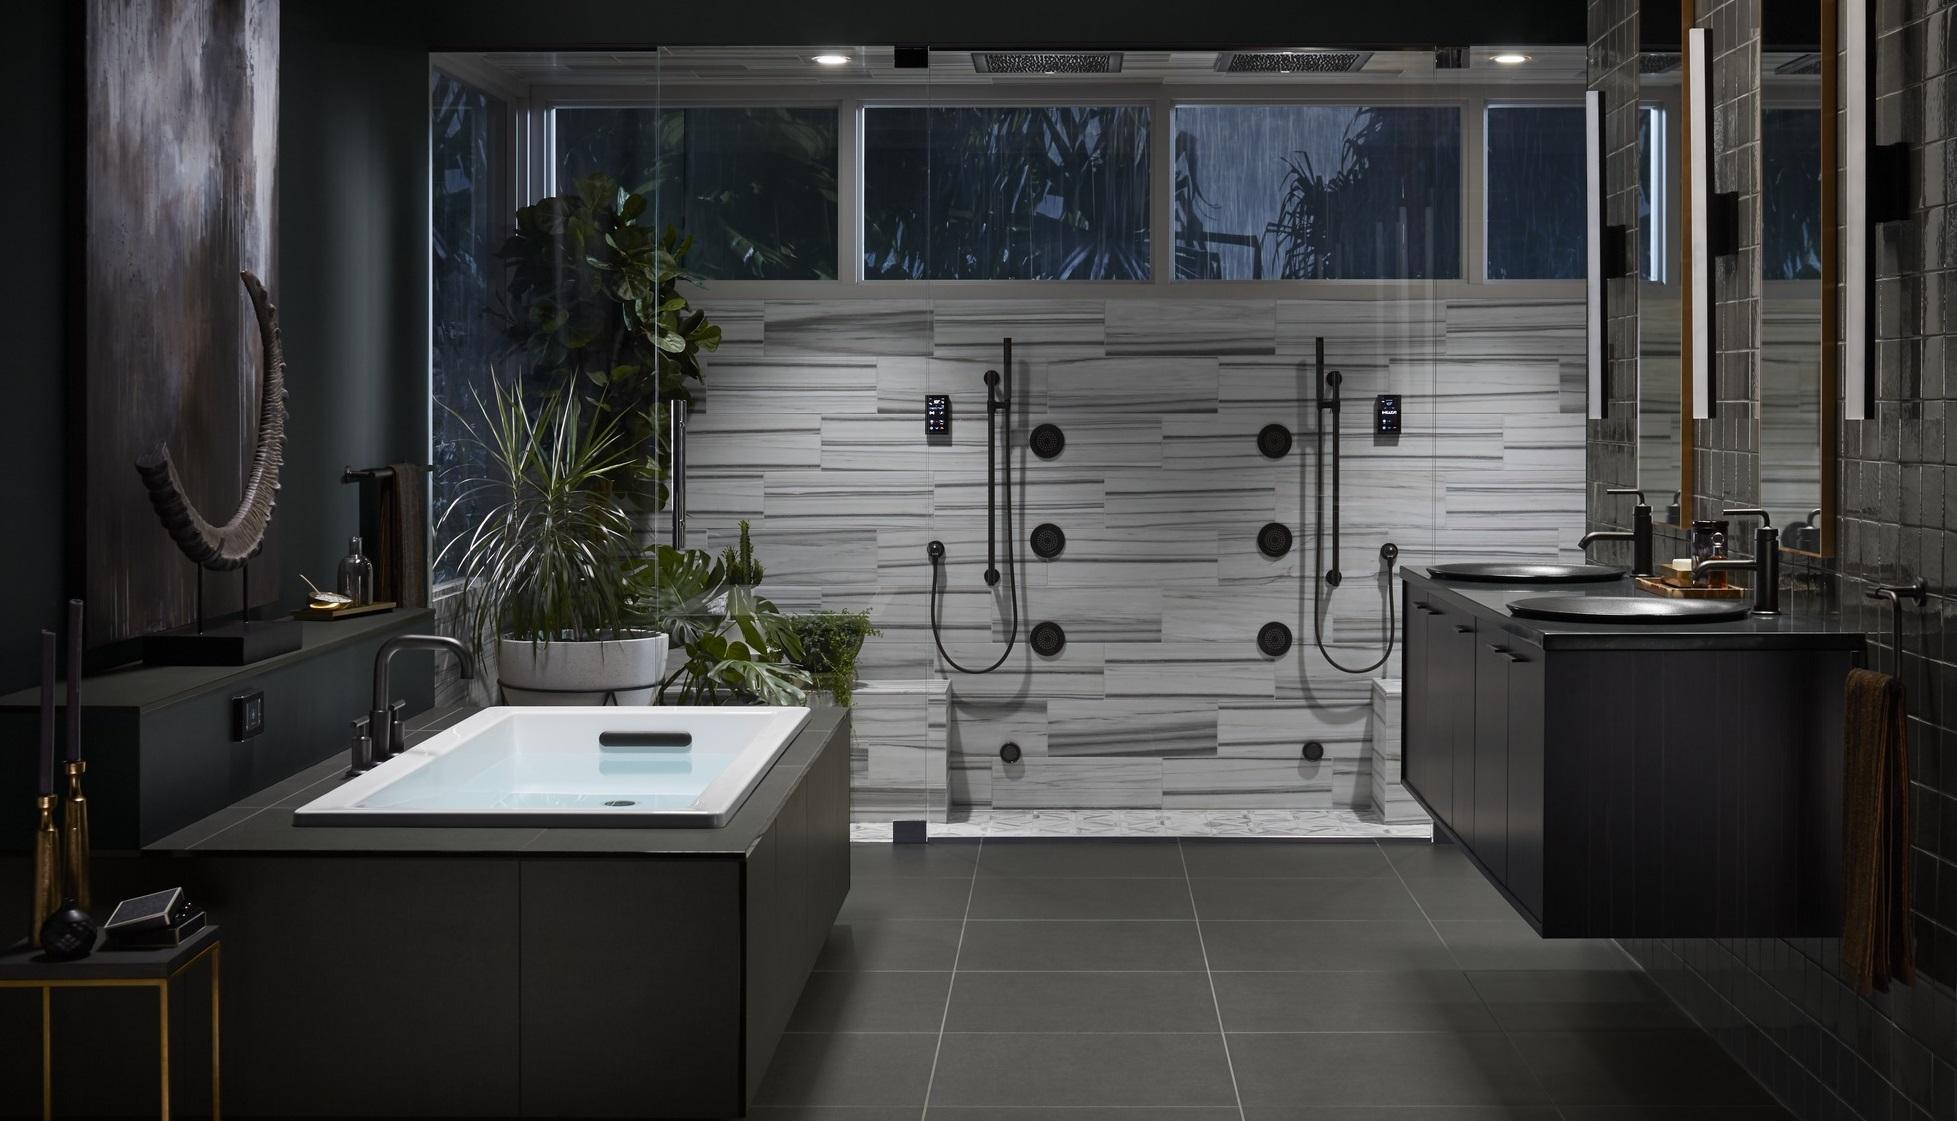 Master Bathroom Ideas On A Budget (Simple & Modern) #22